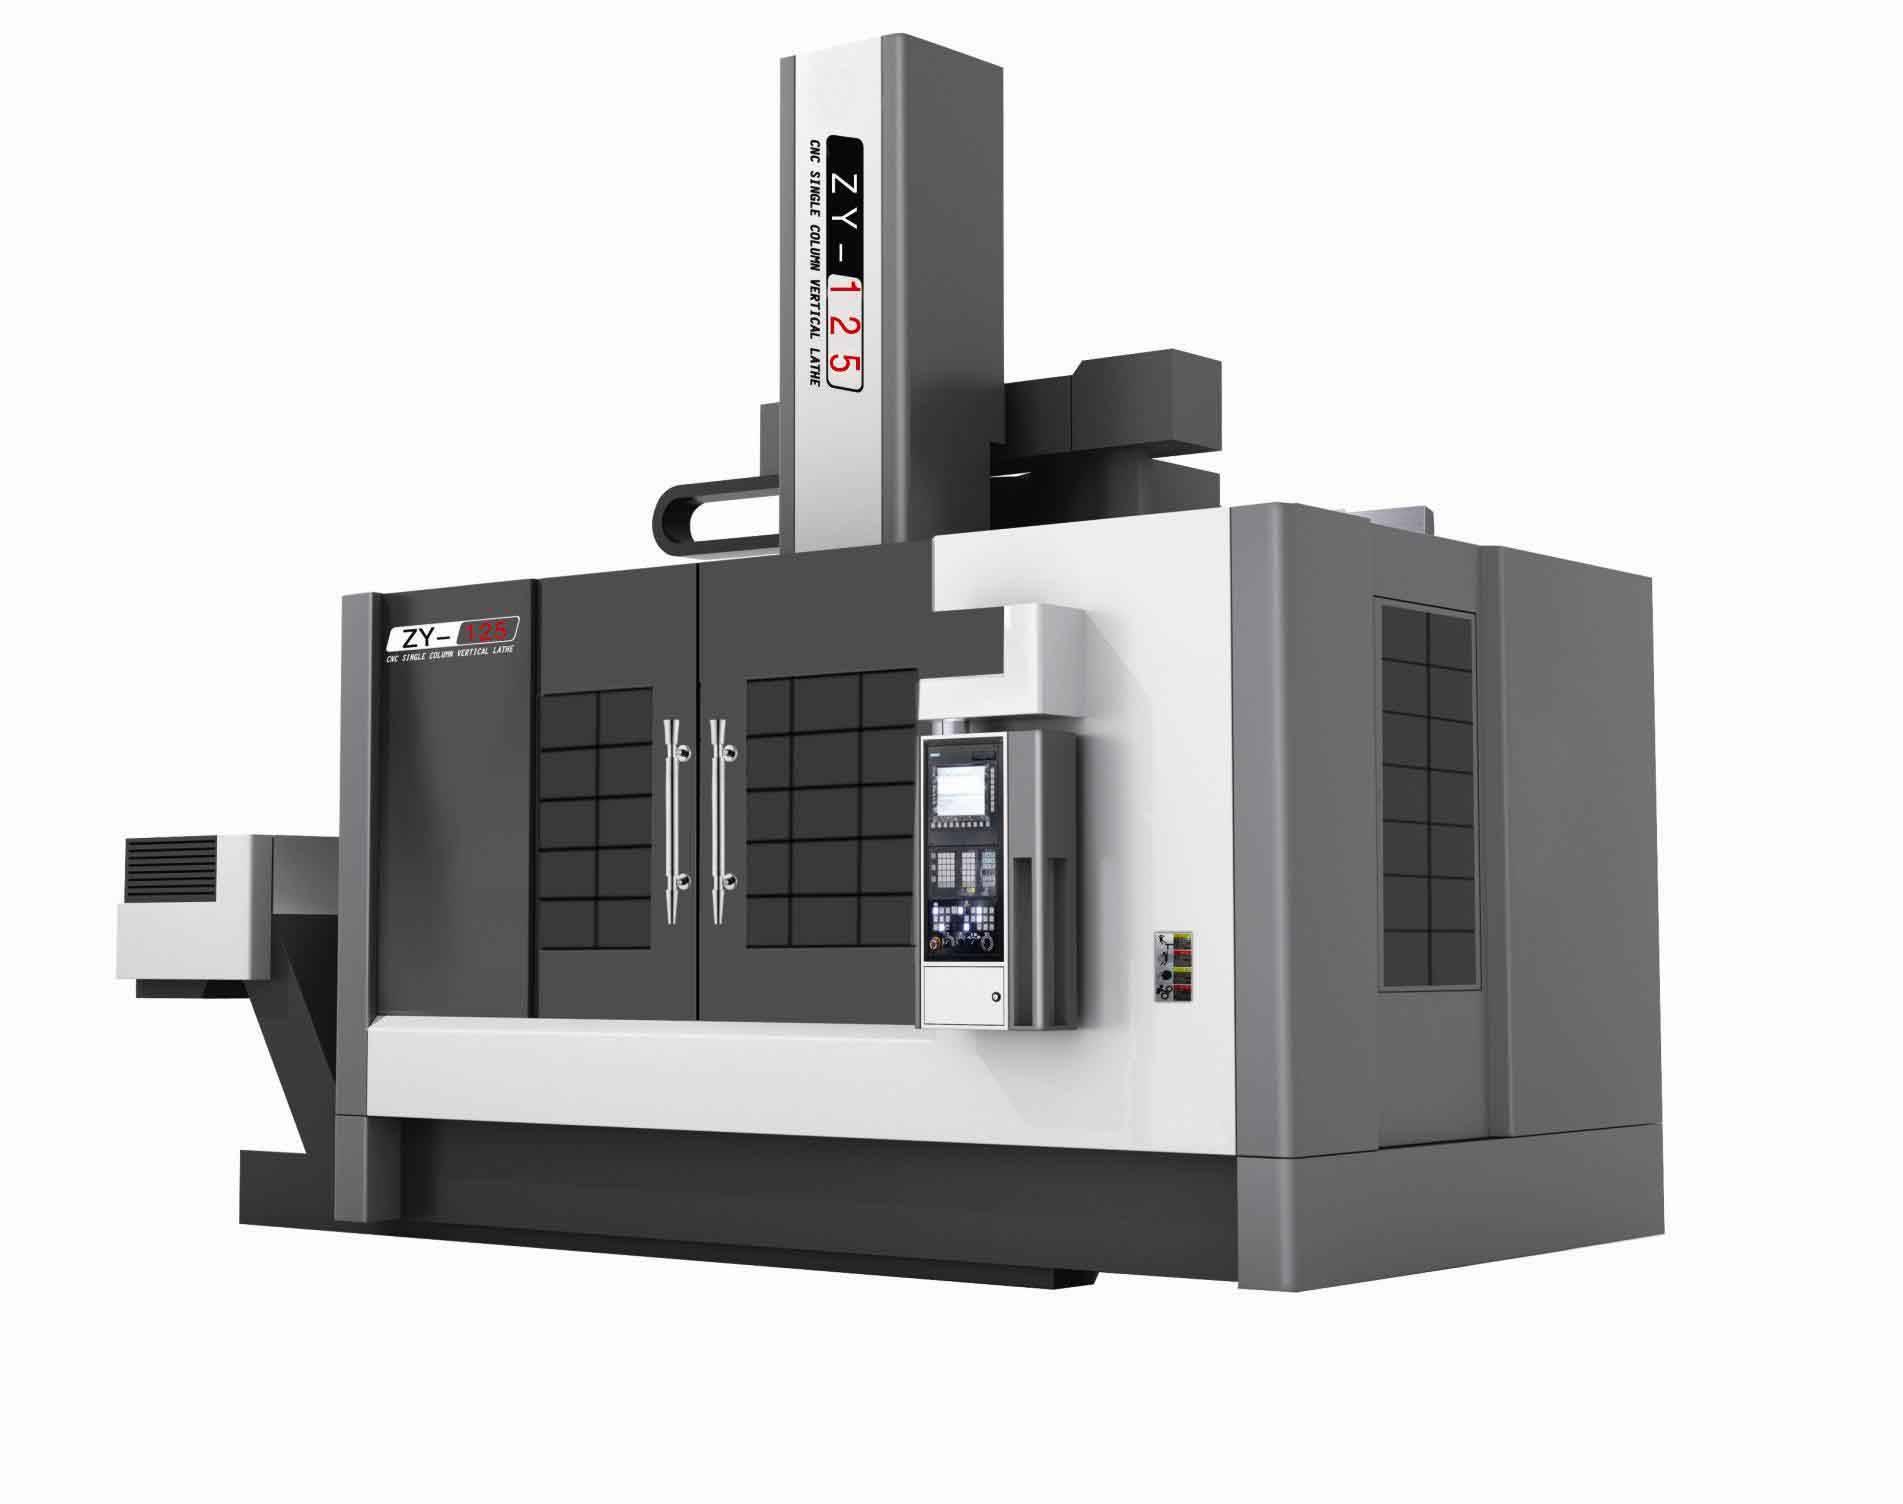 China Good Price High Quality CNC Single Column High Speed Vertical Lathe Machine